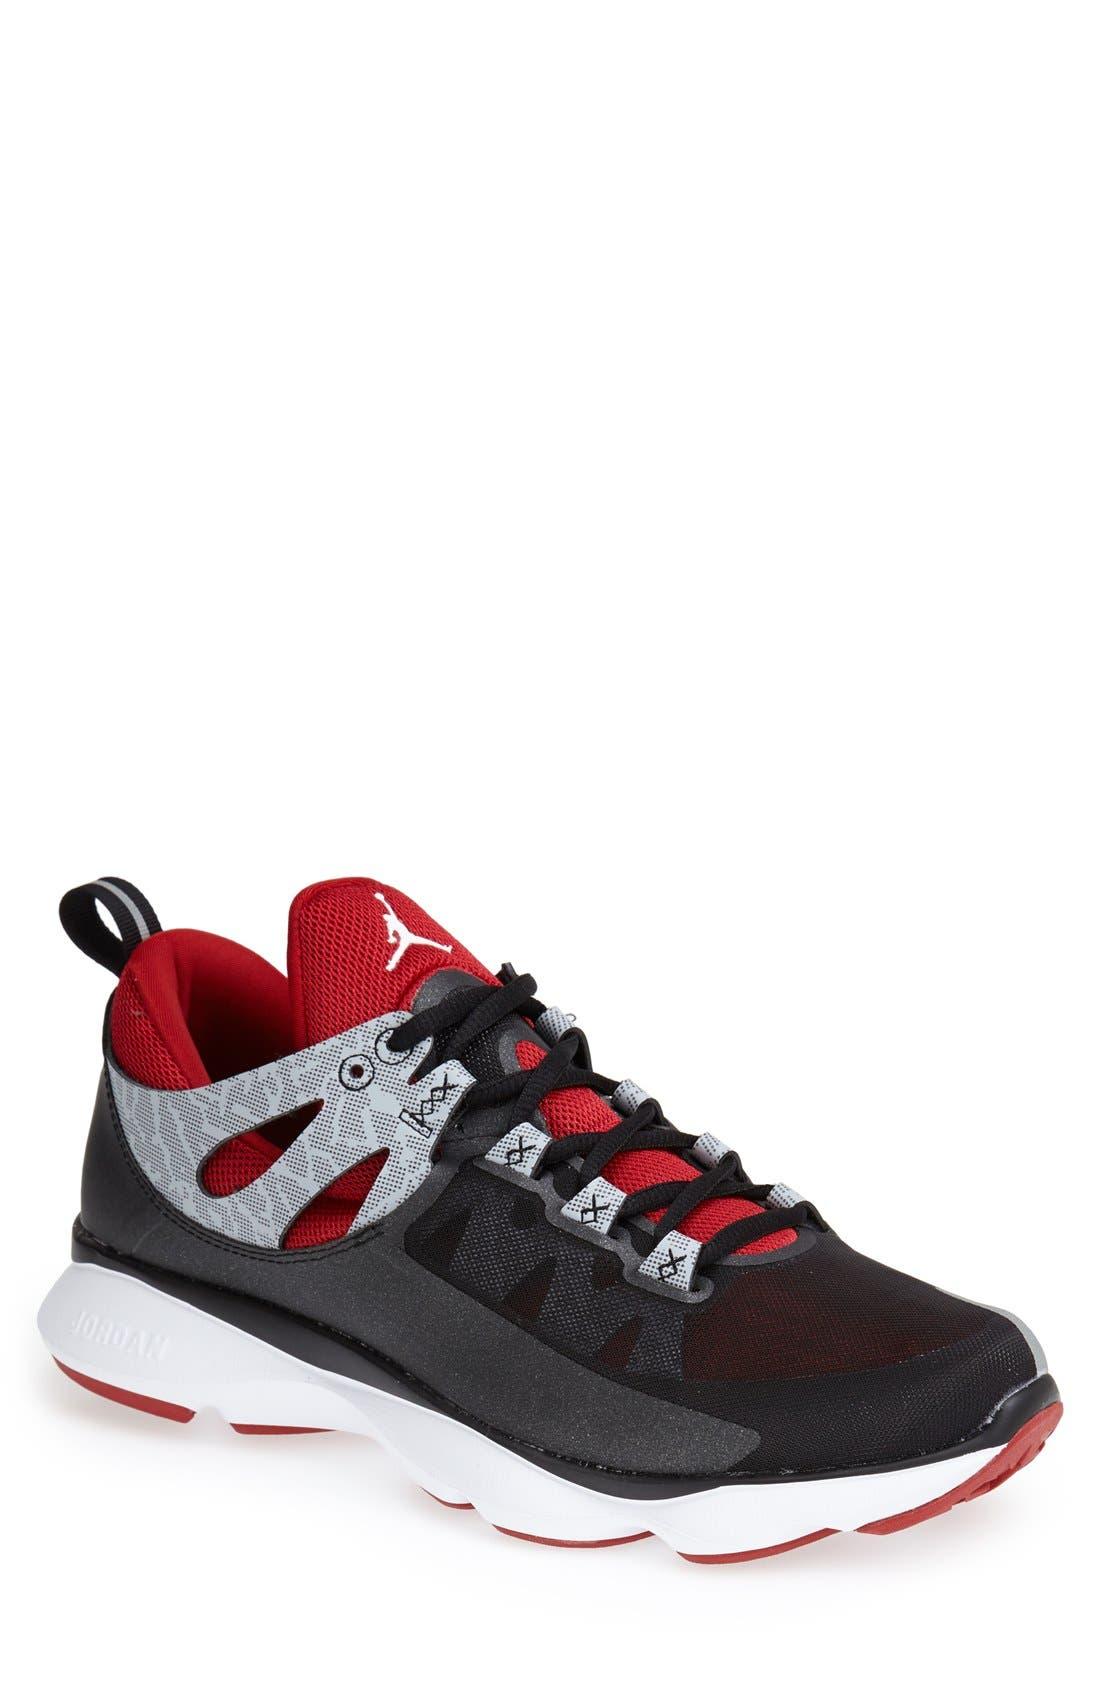 Main Image - Nike 'Jordan Flight Runner' Training Shoe (Men)